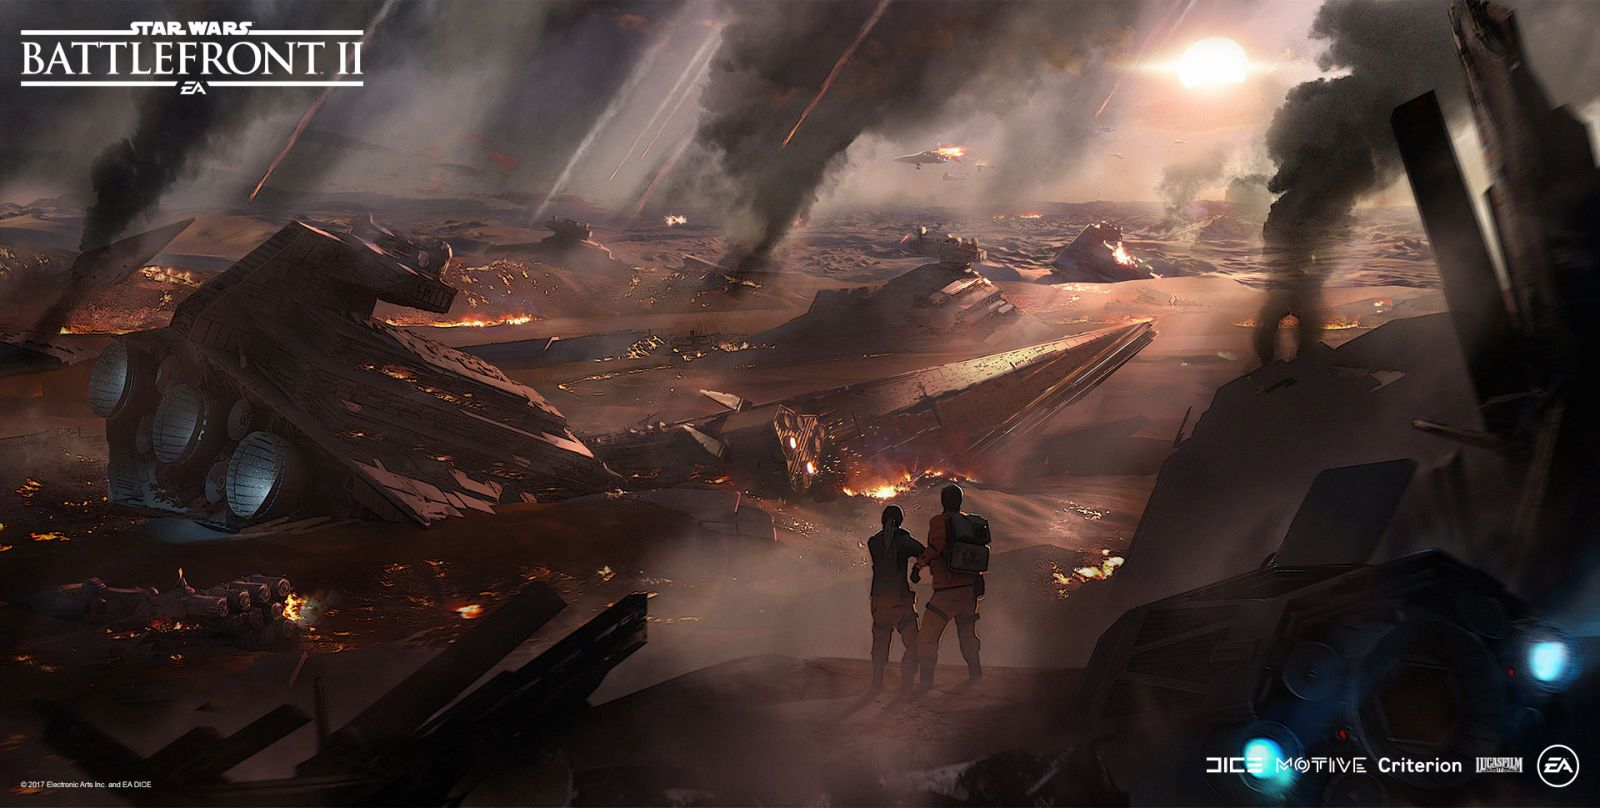 The Art Of Star Wars Battlefront Ii Star Wars Battlefront Concept Art World Star Wars Poster